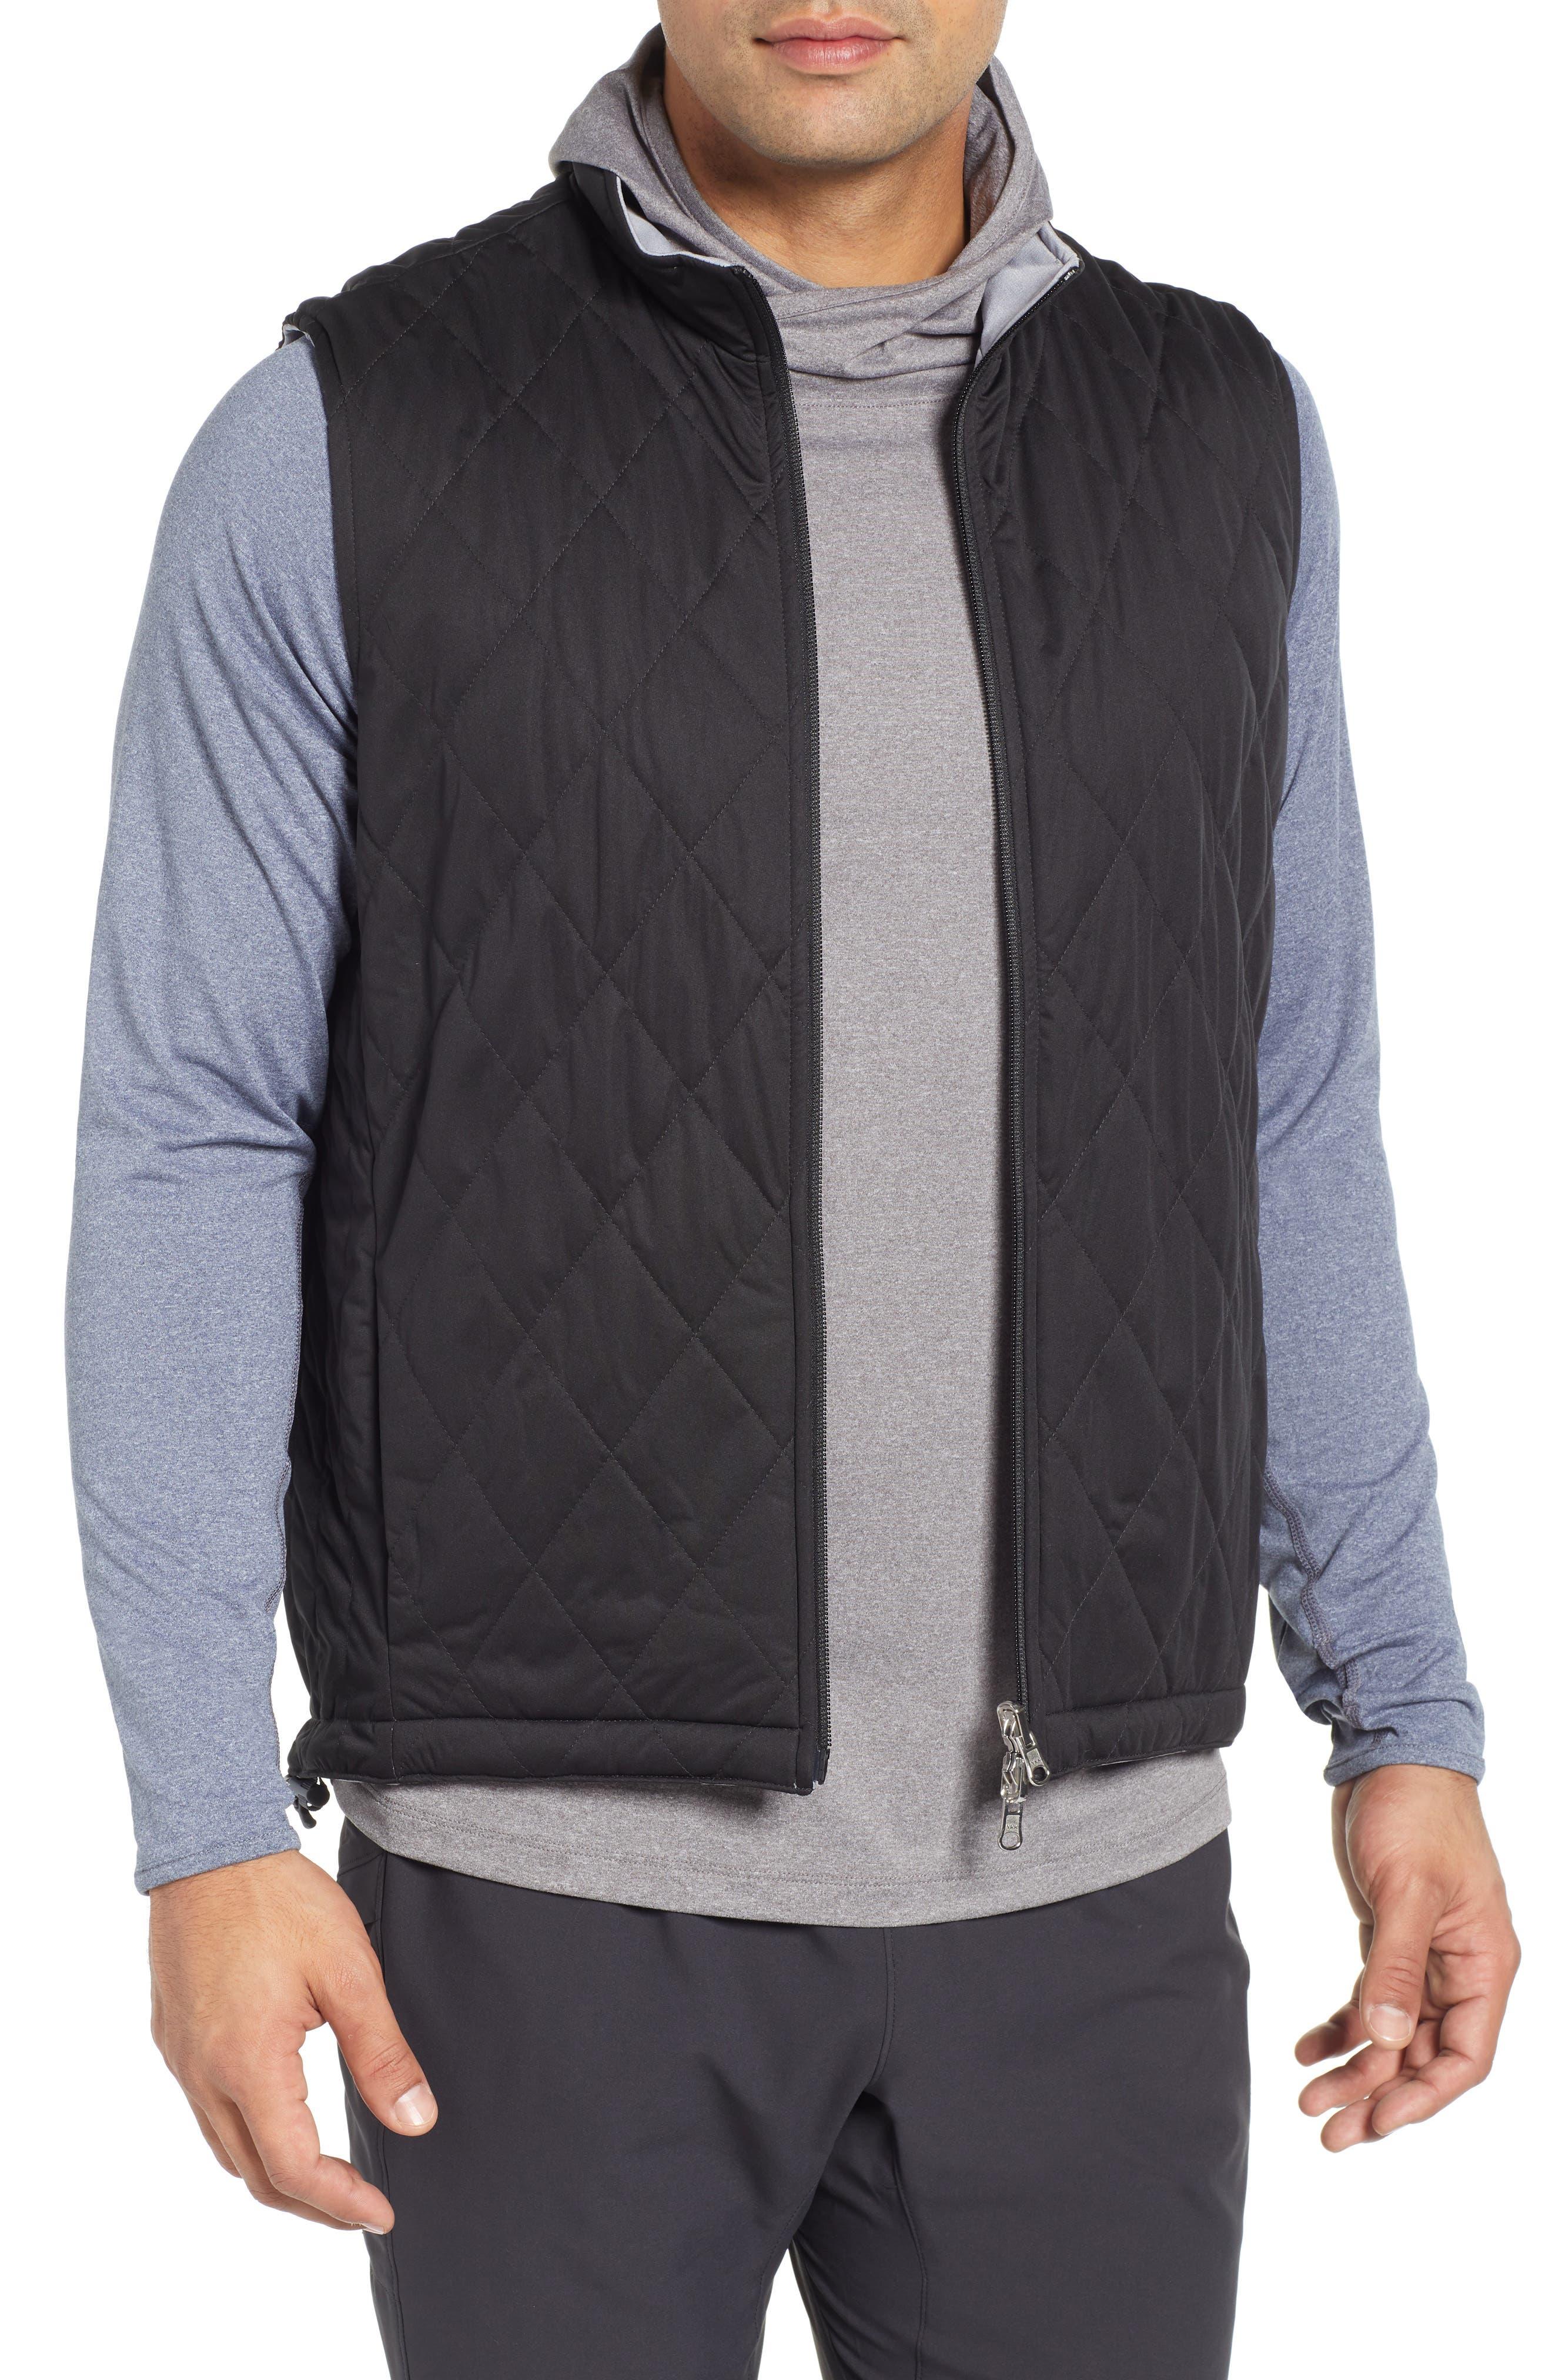 Deuce Regular Fit Reversible Quilted Vest,                             Main thumbnail 1, color,                             001